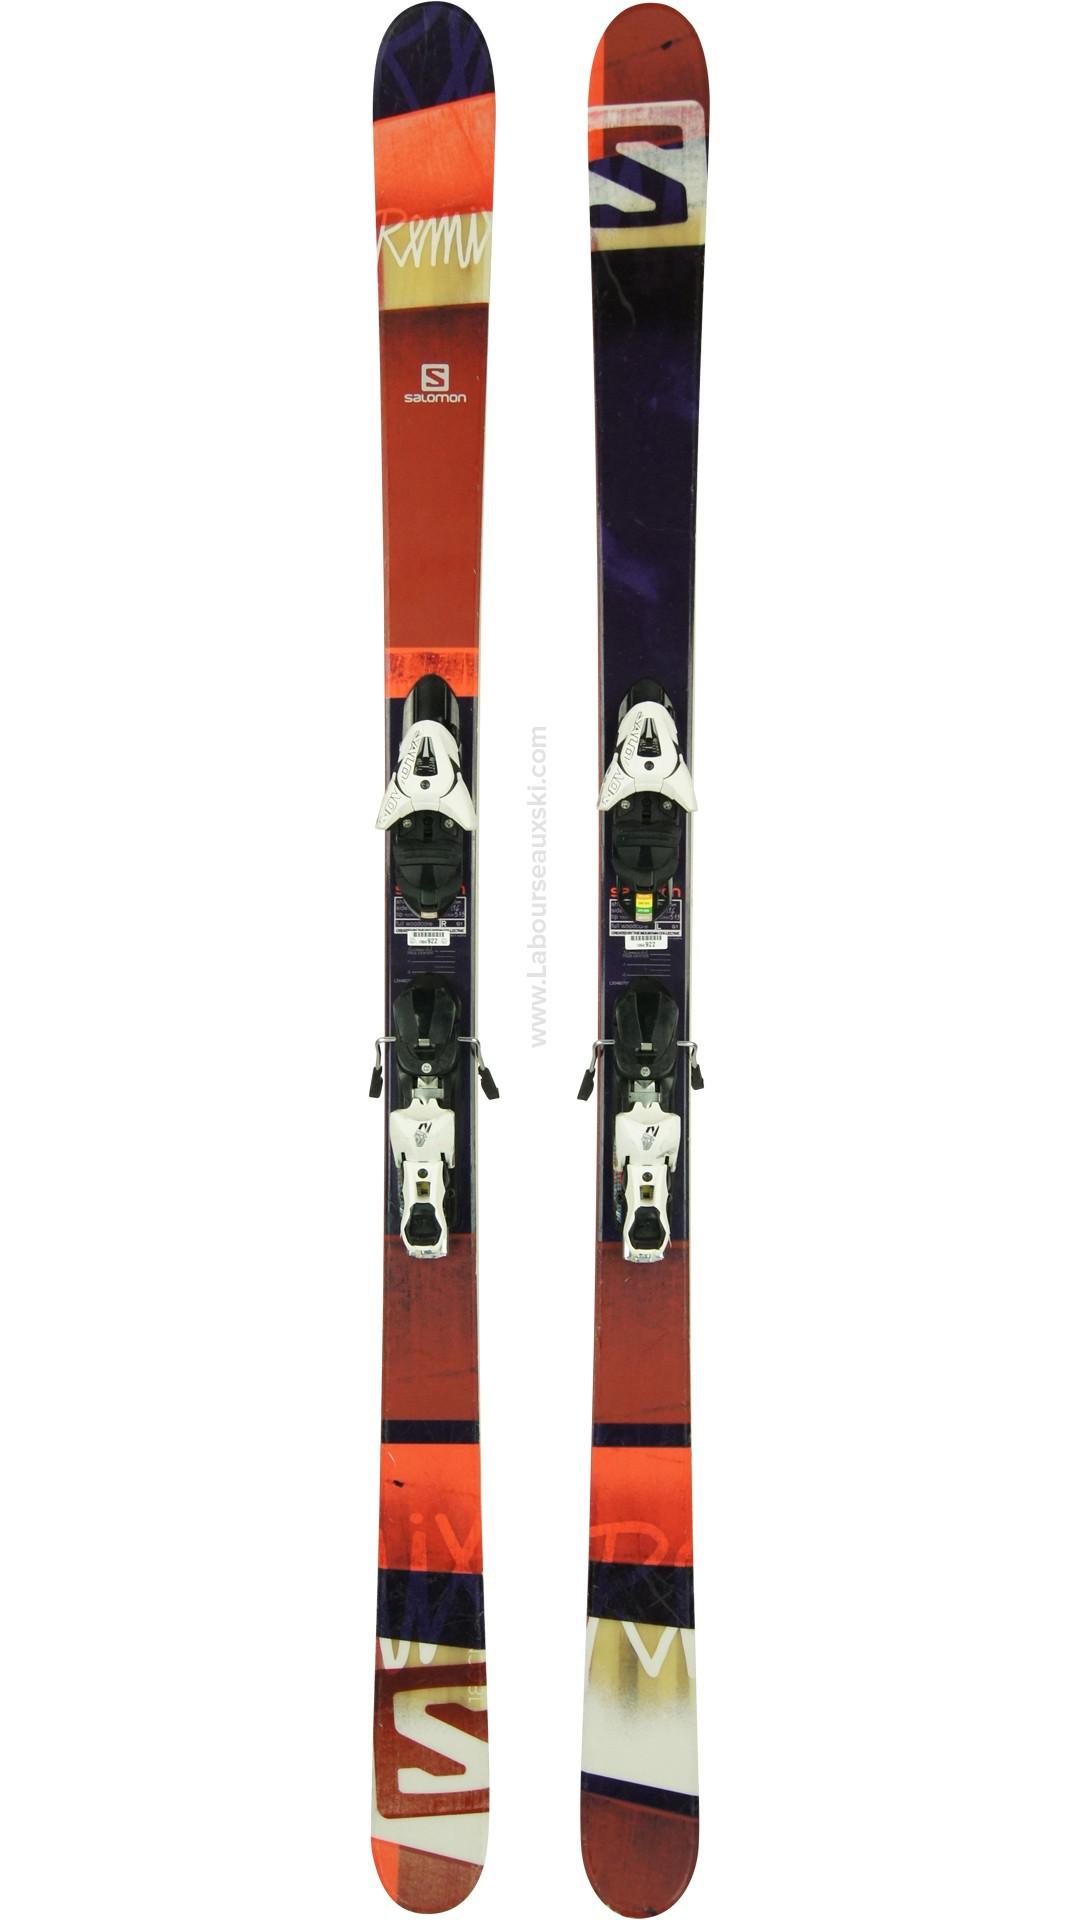 ski occasion salomon remix skis d 39 occasion. Black Bedroom Furniture Sets. Home Design Ideas